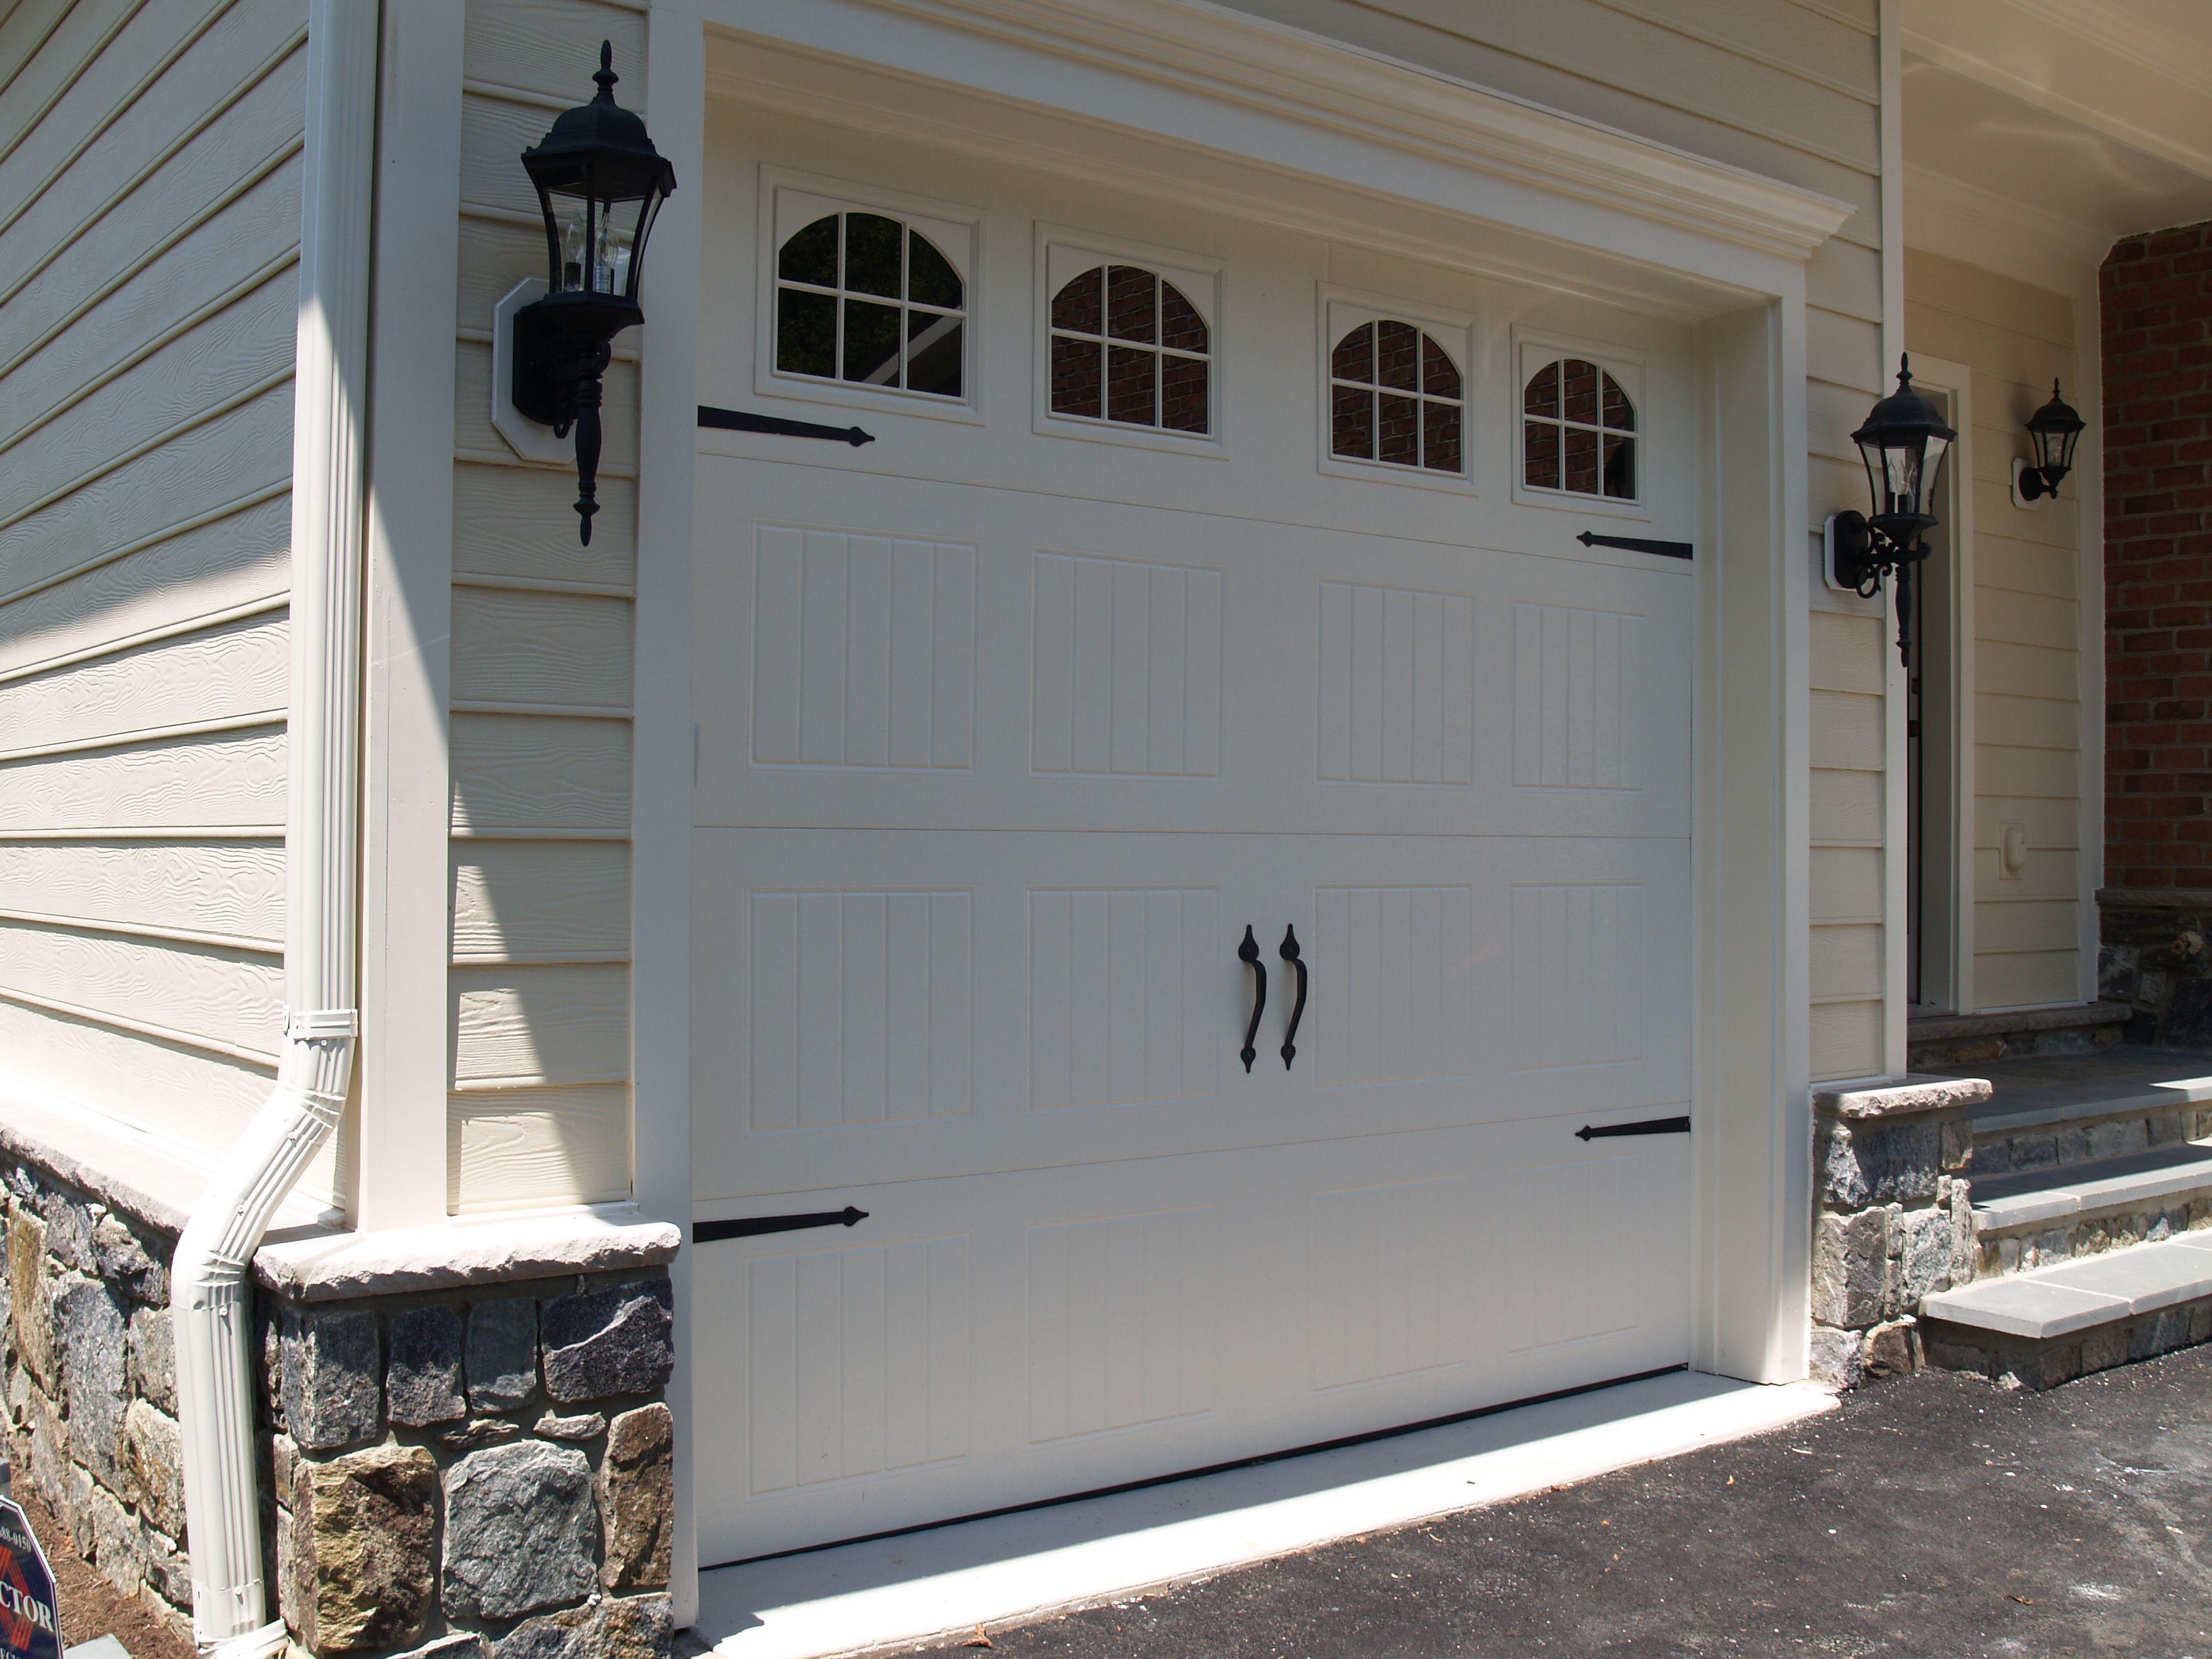 Wayne Dalton garage door  Garage Doors by Wayne Dalton  Pinterest  Wayne dalton Garage